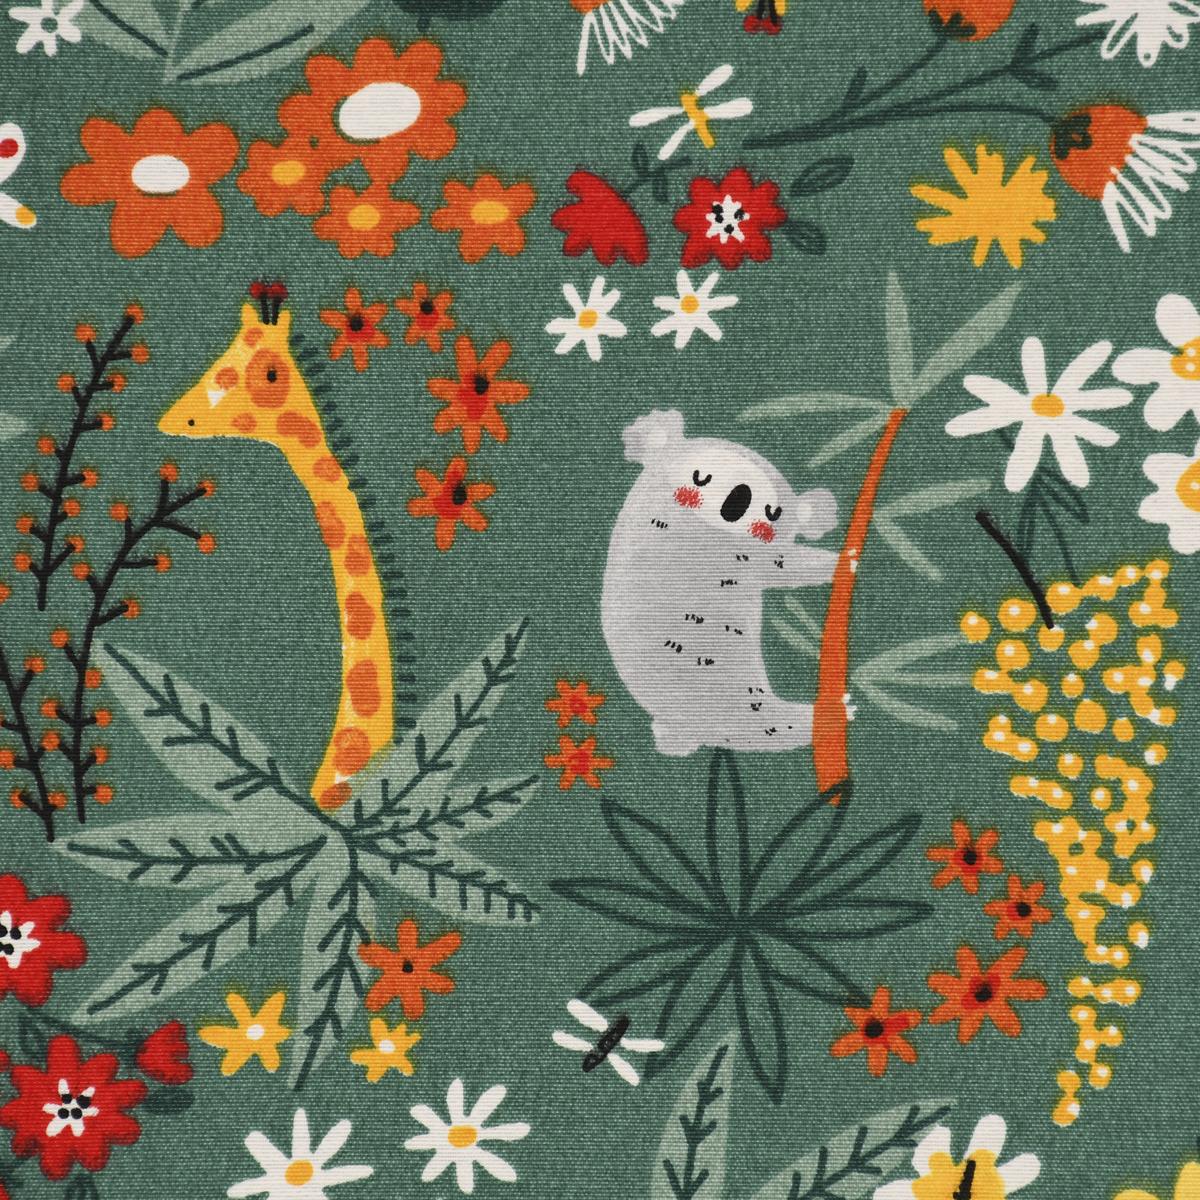 Dekostoff Ottoman Canvas Koala and Friends Dschungelfreunde grün 1,40m Breite